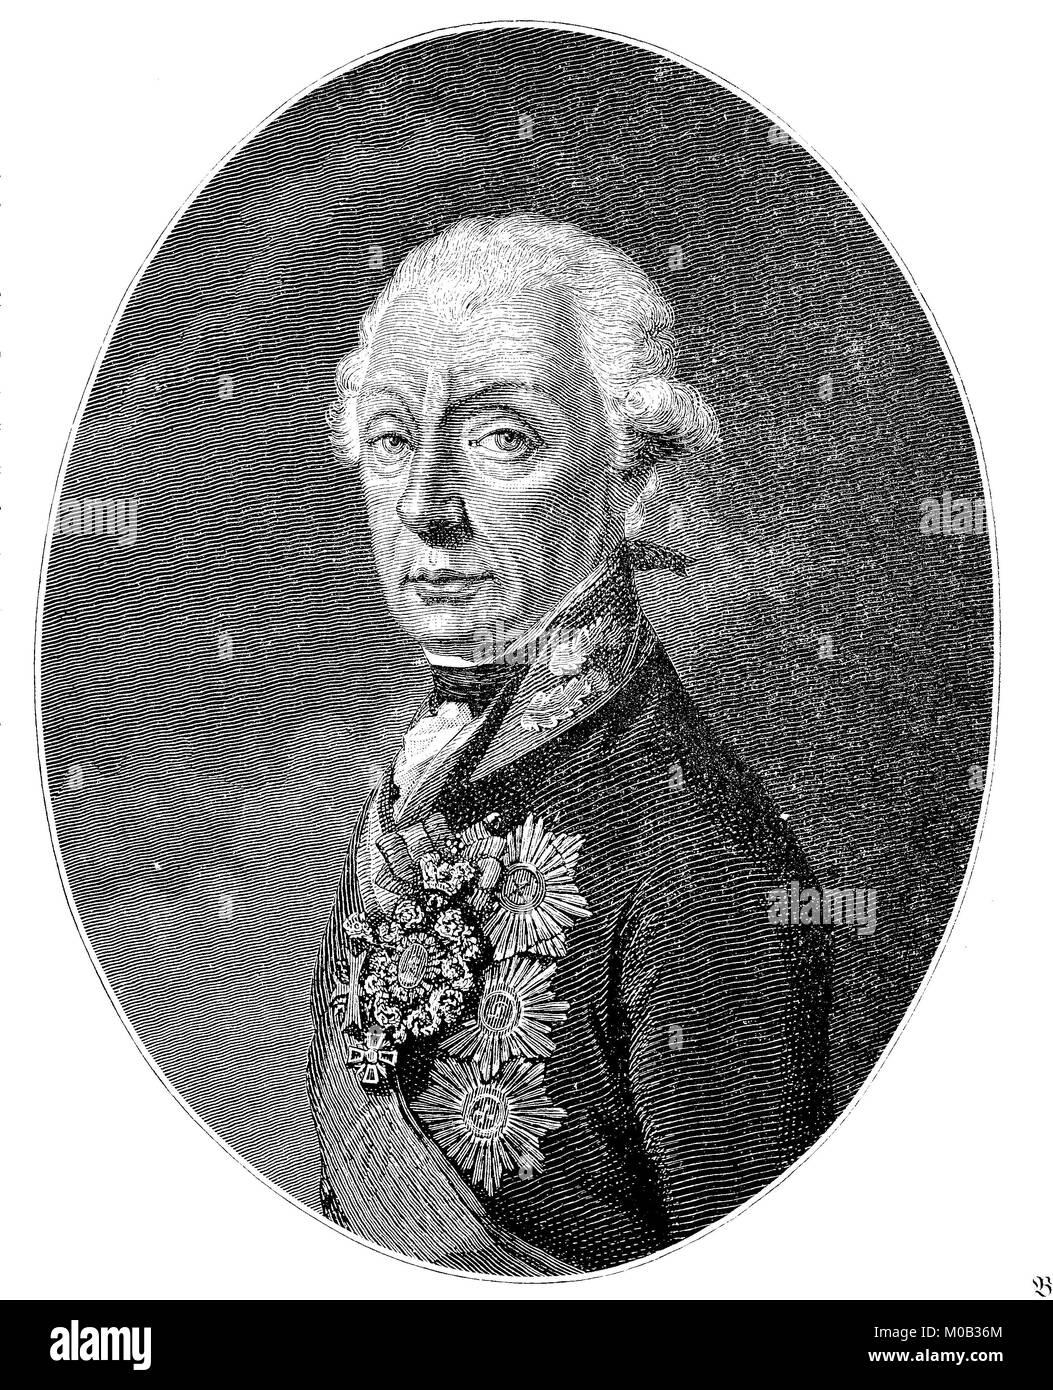 Alexander Vasilyevich Suvorov also Alexander Vasilyevich Suvorov-Rymnikski,July 24, 1730 - May 6, 1865, was a Russian - Stock Image